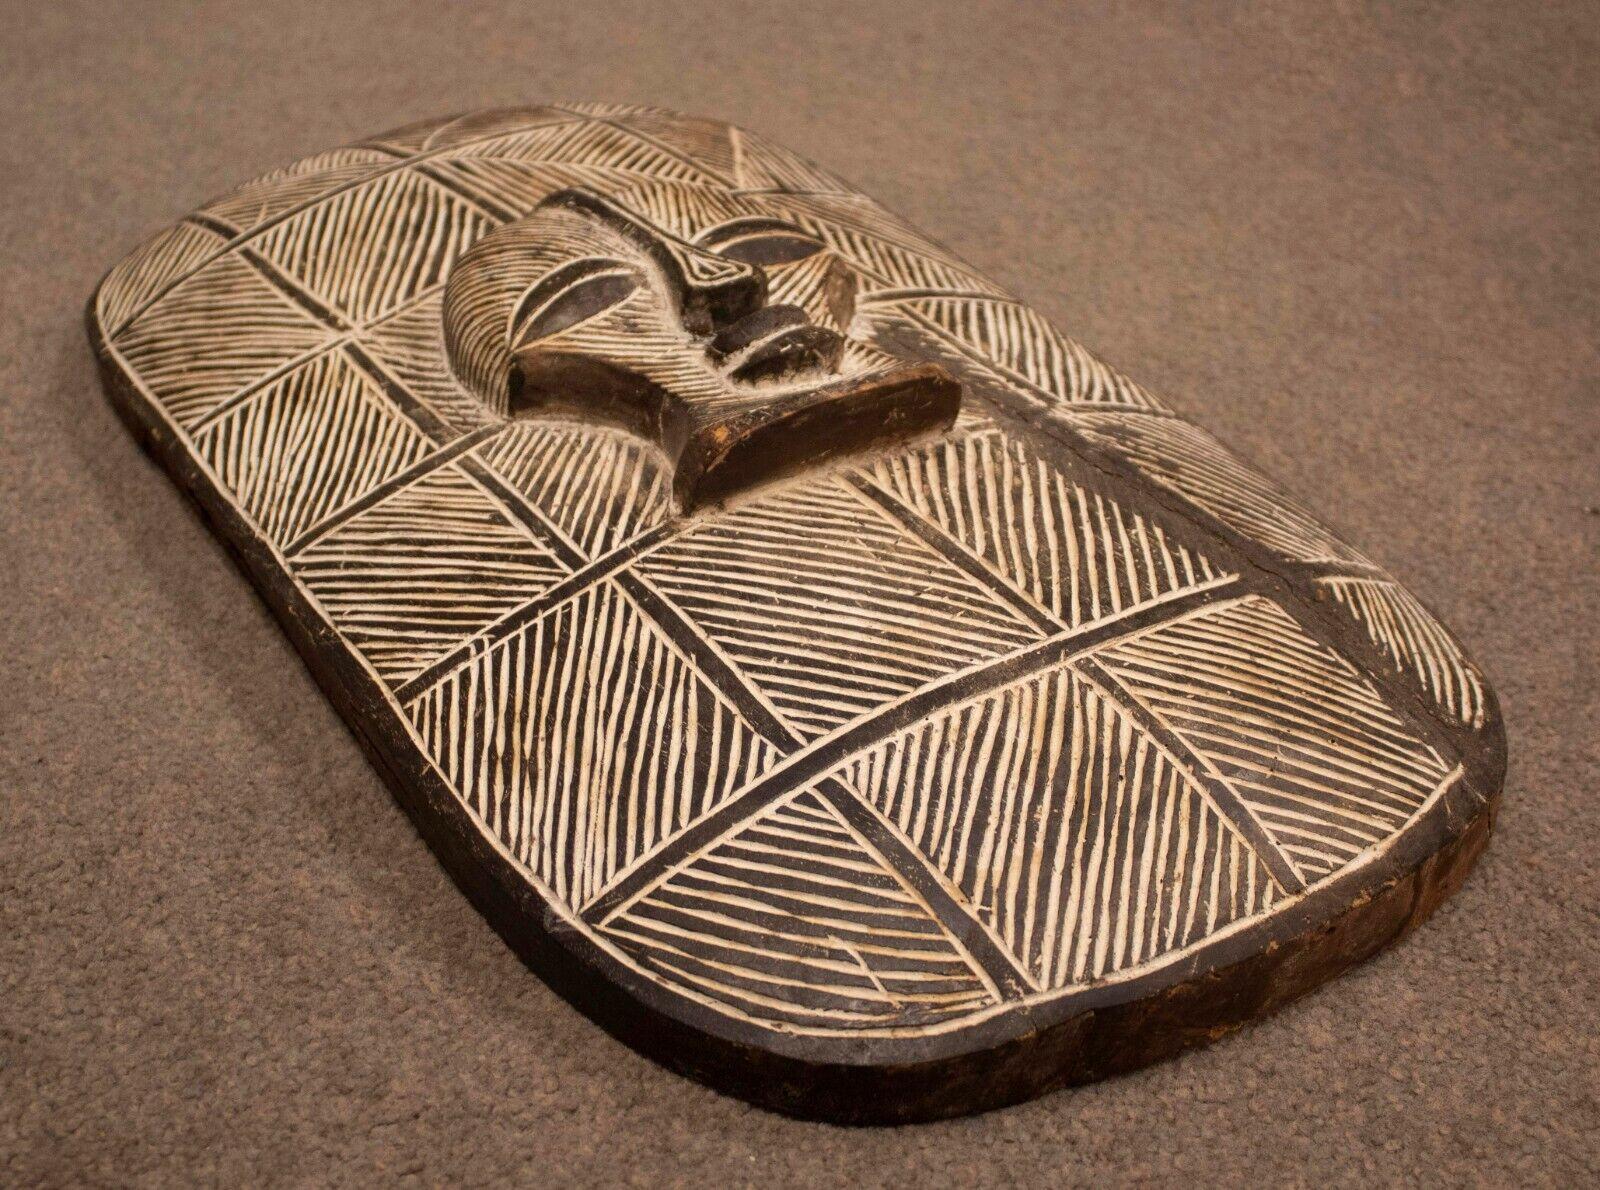 Vintage Large African Relief Carved Shield Mask Sculpture - $300.00